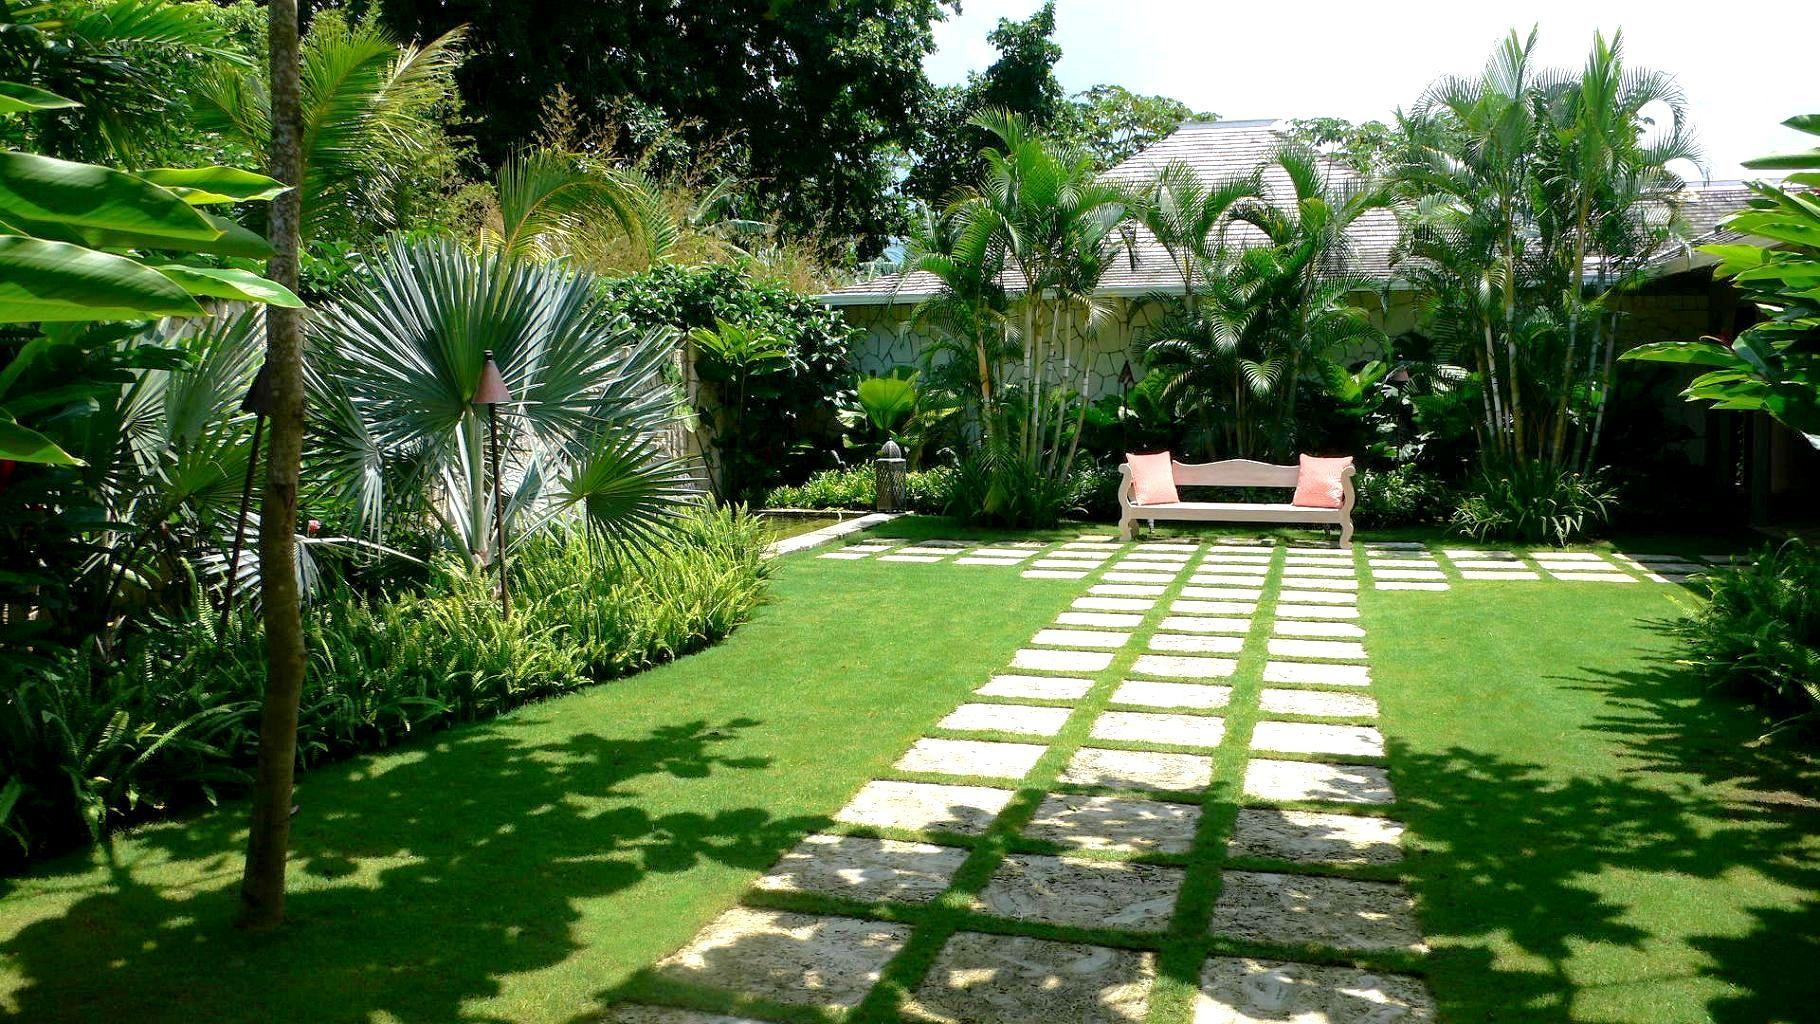 Nz Backyard Amp Garden Design Ideas Magazine | Large Backyard Landscaping, Modern Landscaping, Backyard Landscaping